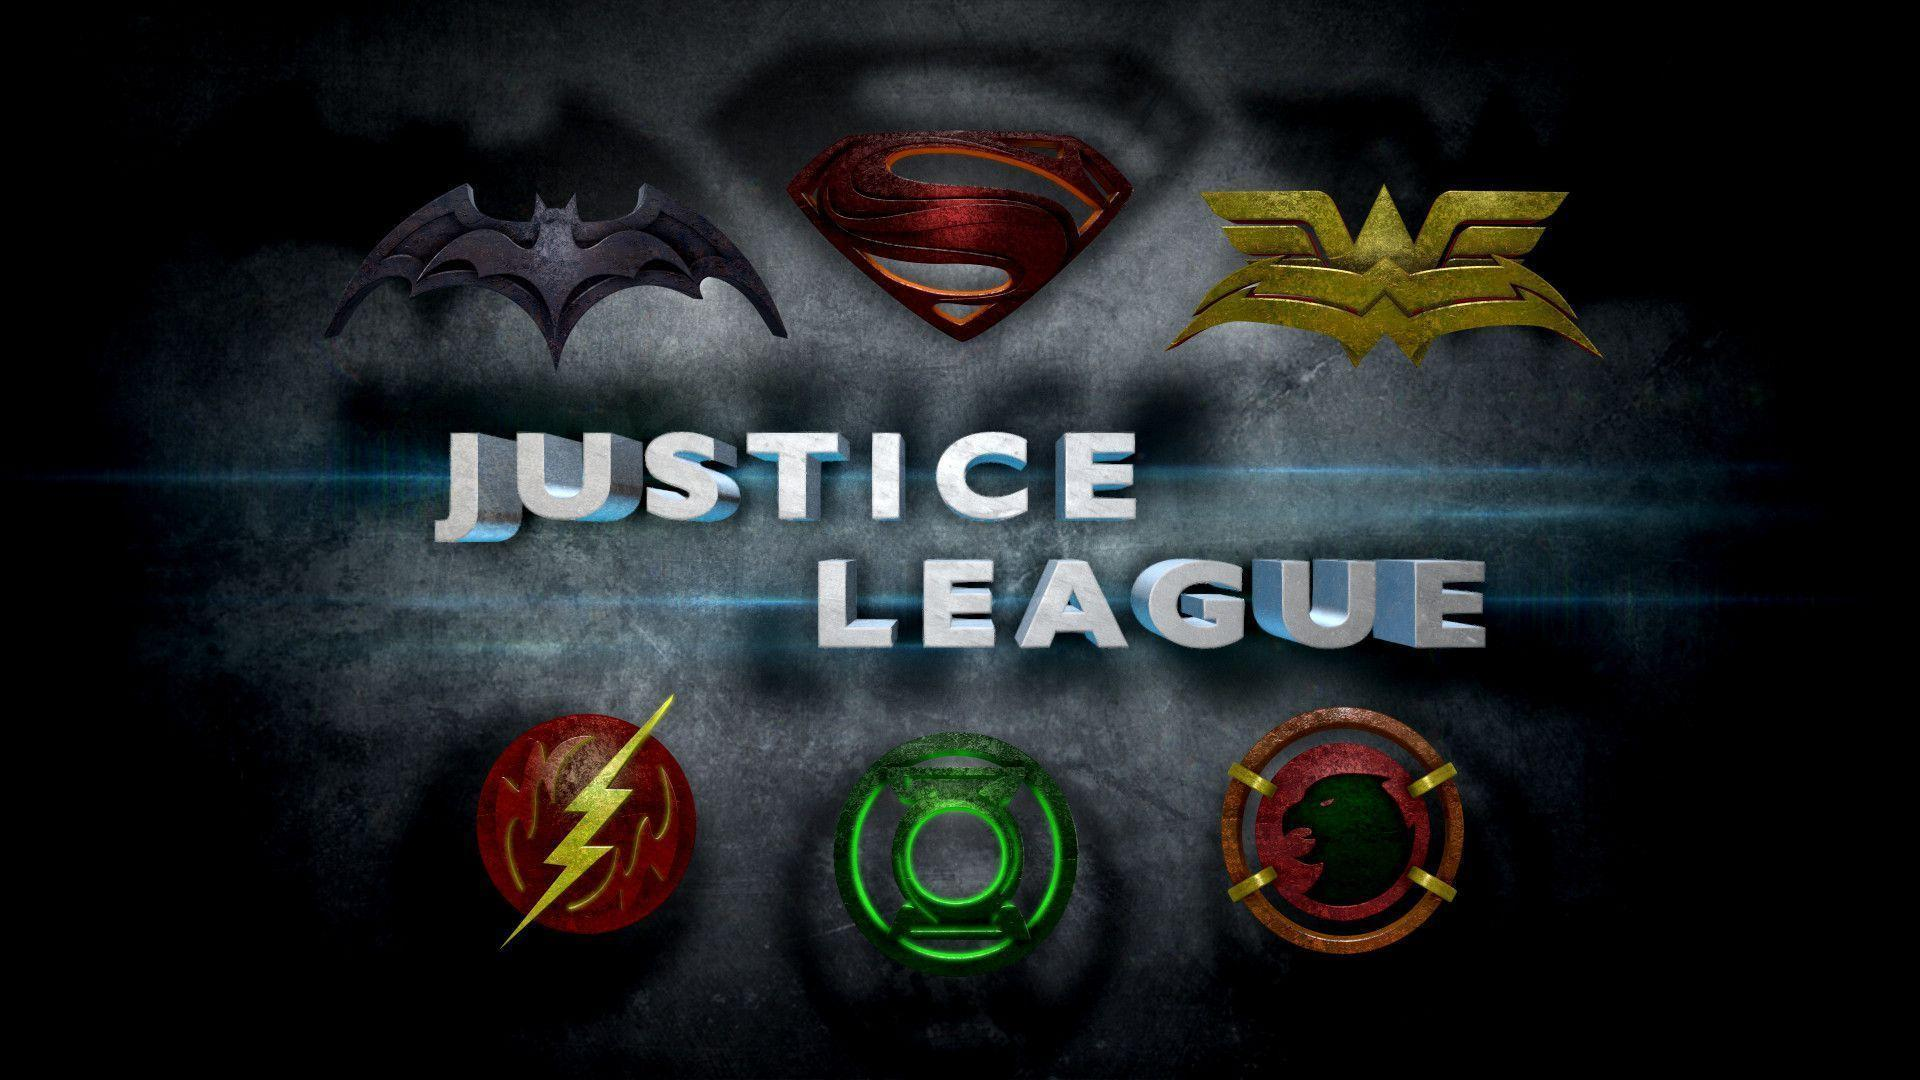 Amazing Wallpaper Logo Justice League - wc1771069  Photograph_291324.jpg